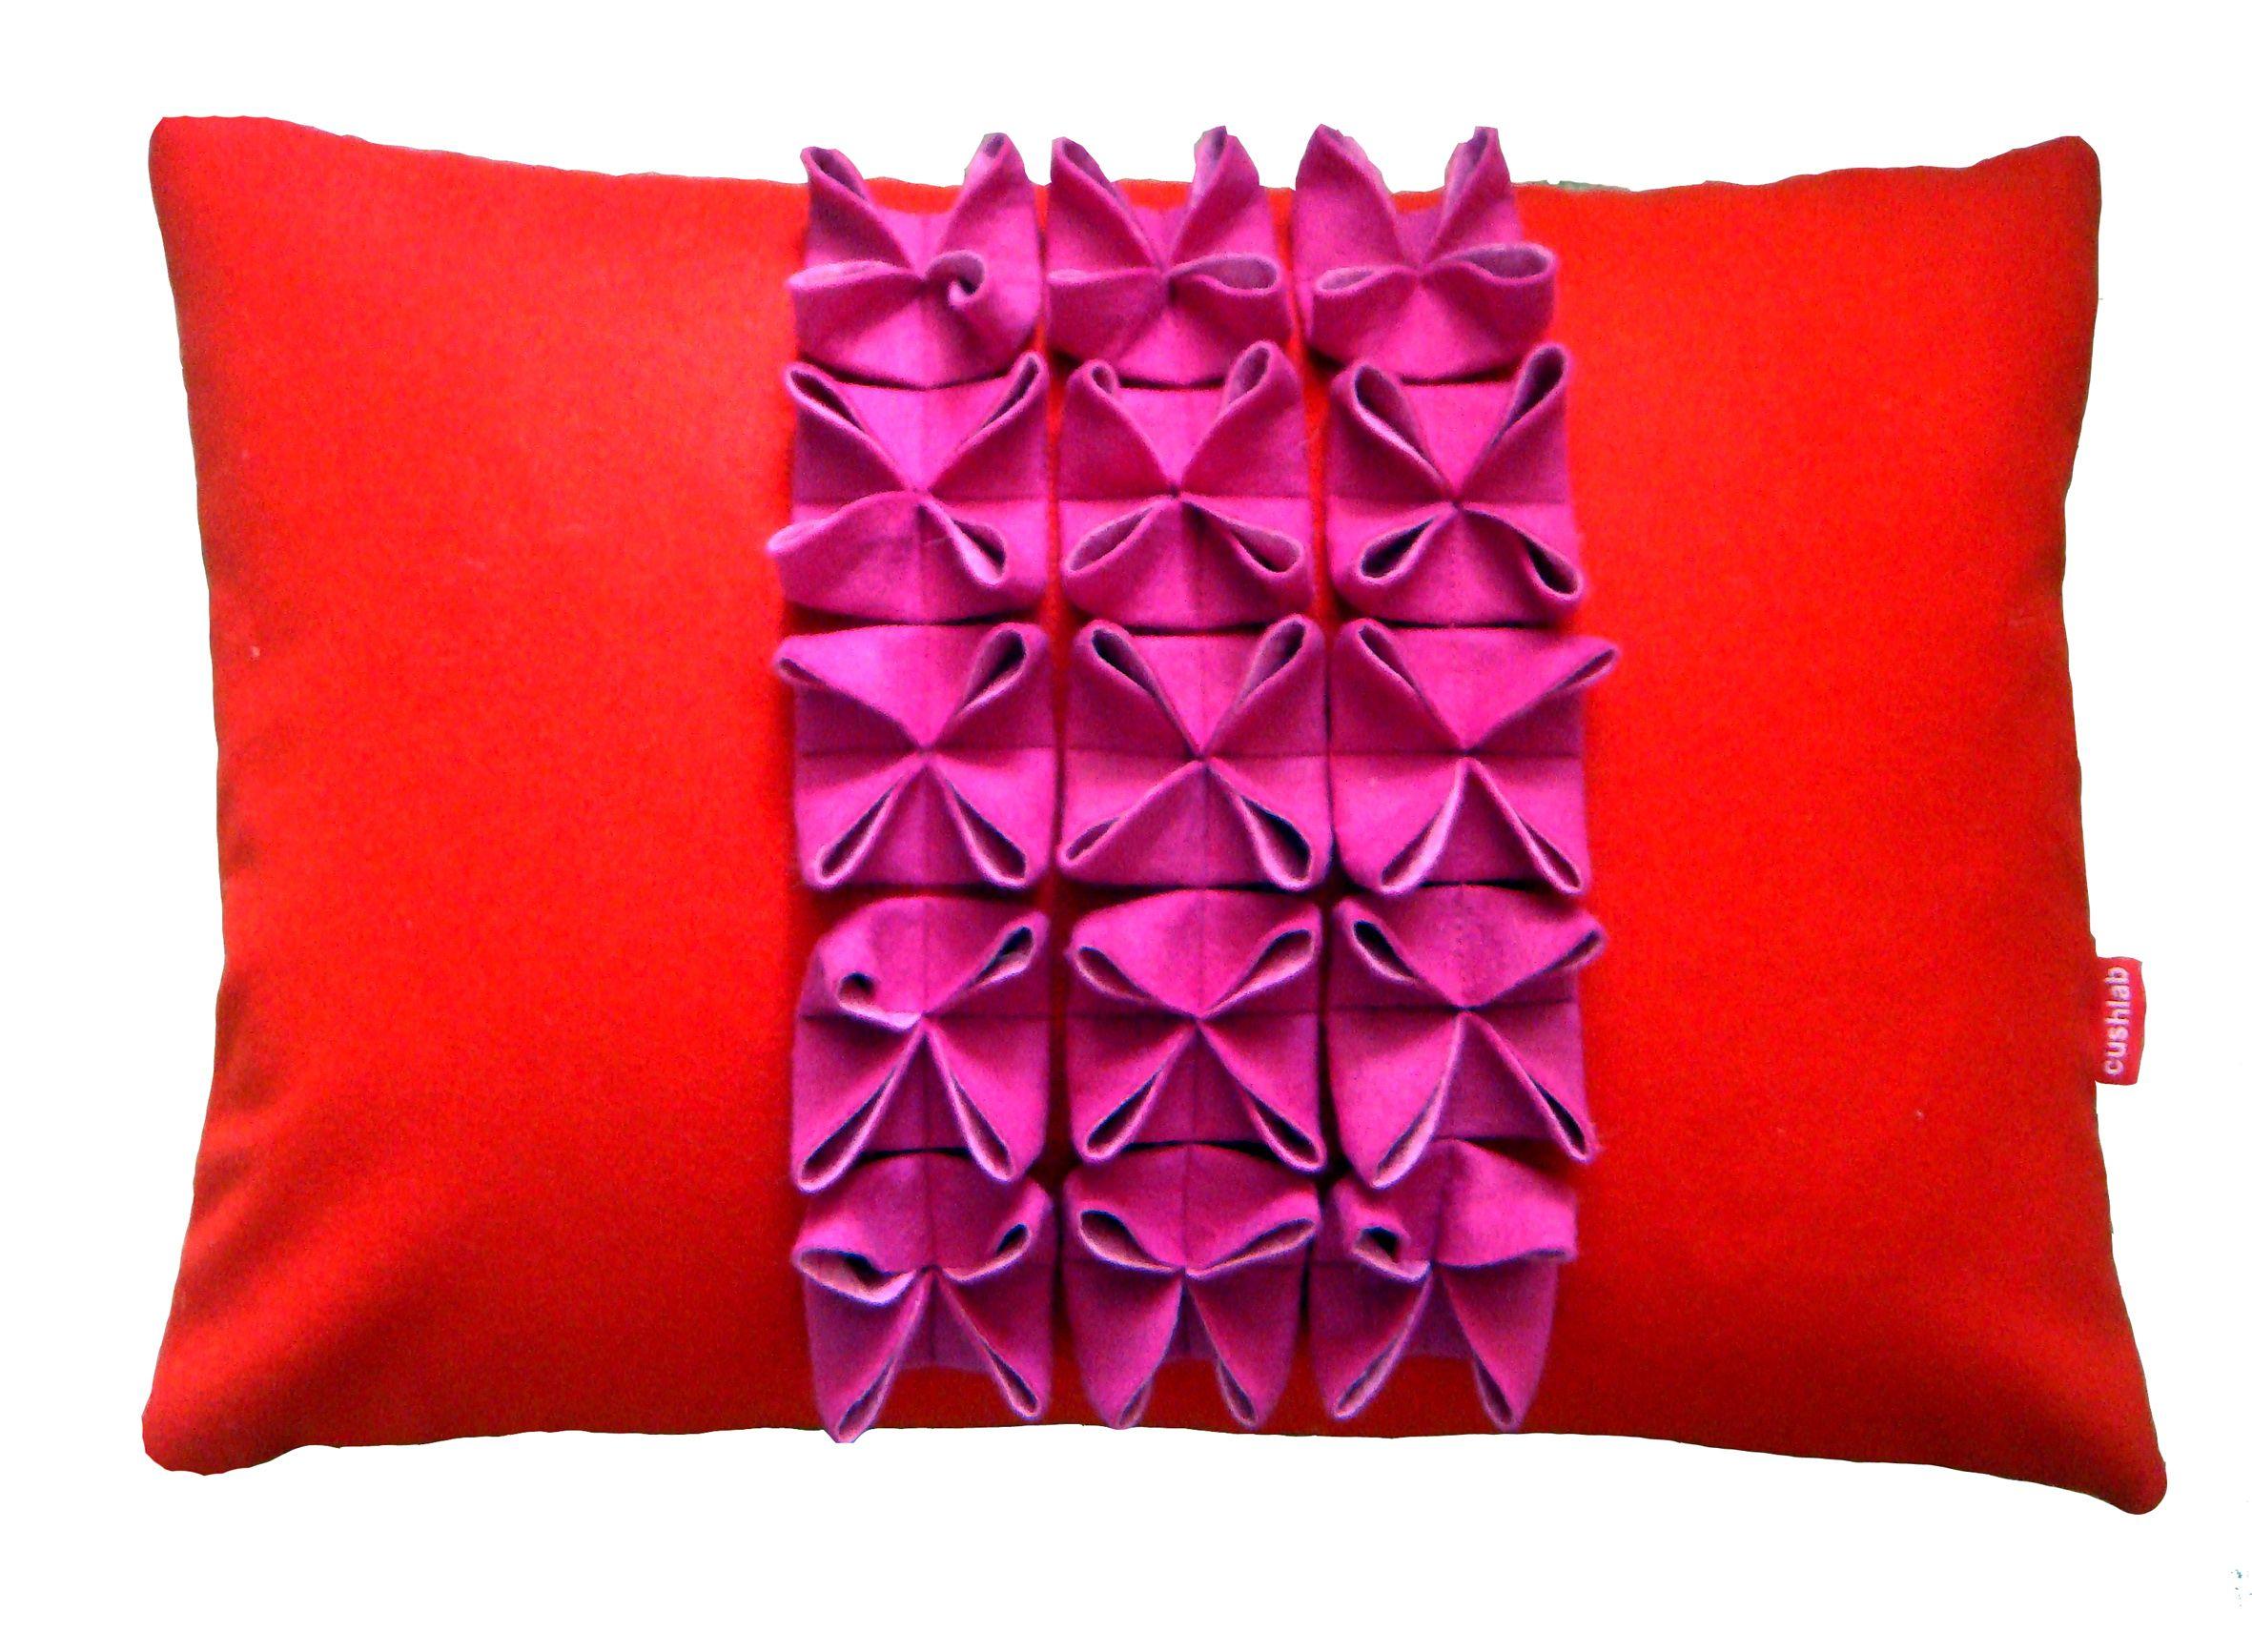 Flower Cushion Designs Google Search Cushion Covers To Make